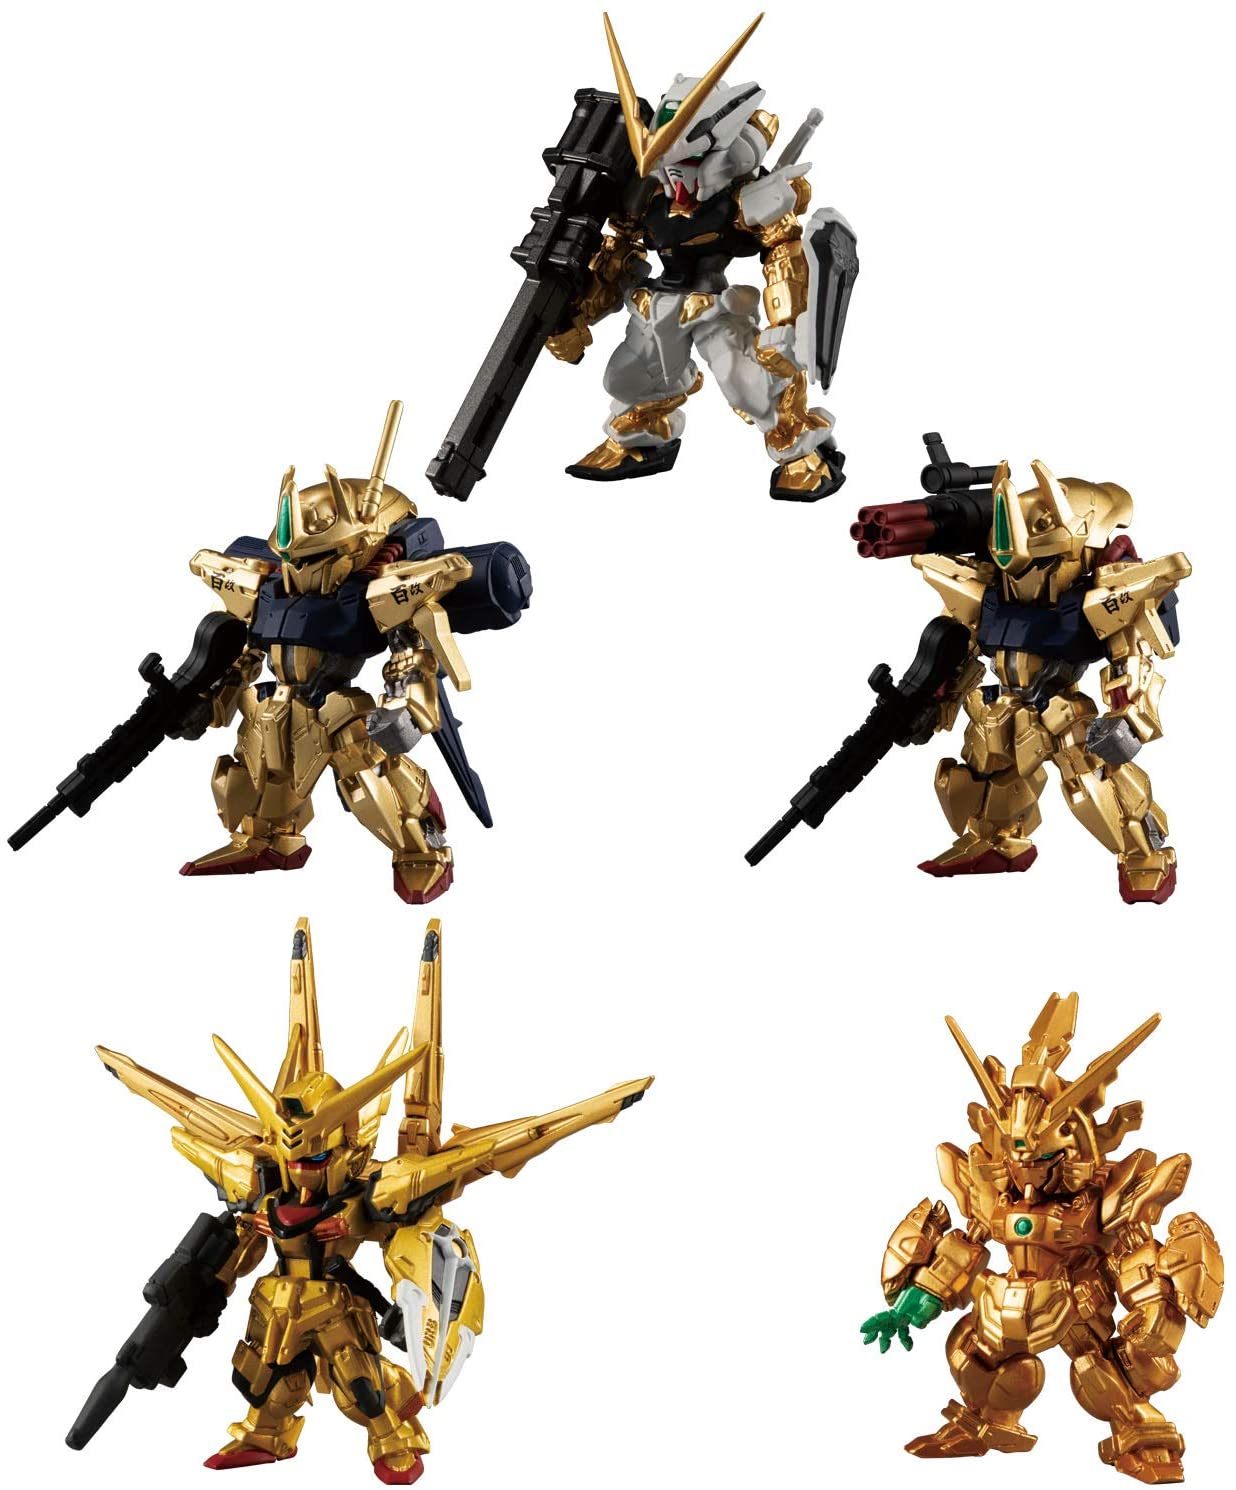 "Bandai FW Gundam Converge Gold Edition ""Mobile Suit Gundam"", Bandai Converge  (8/BOX)"